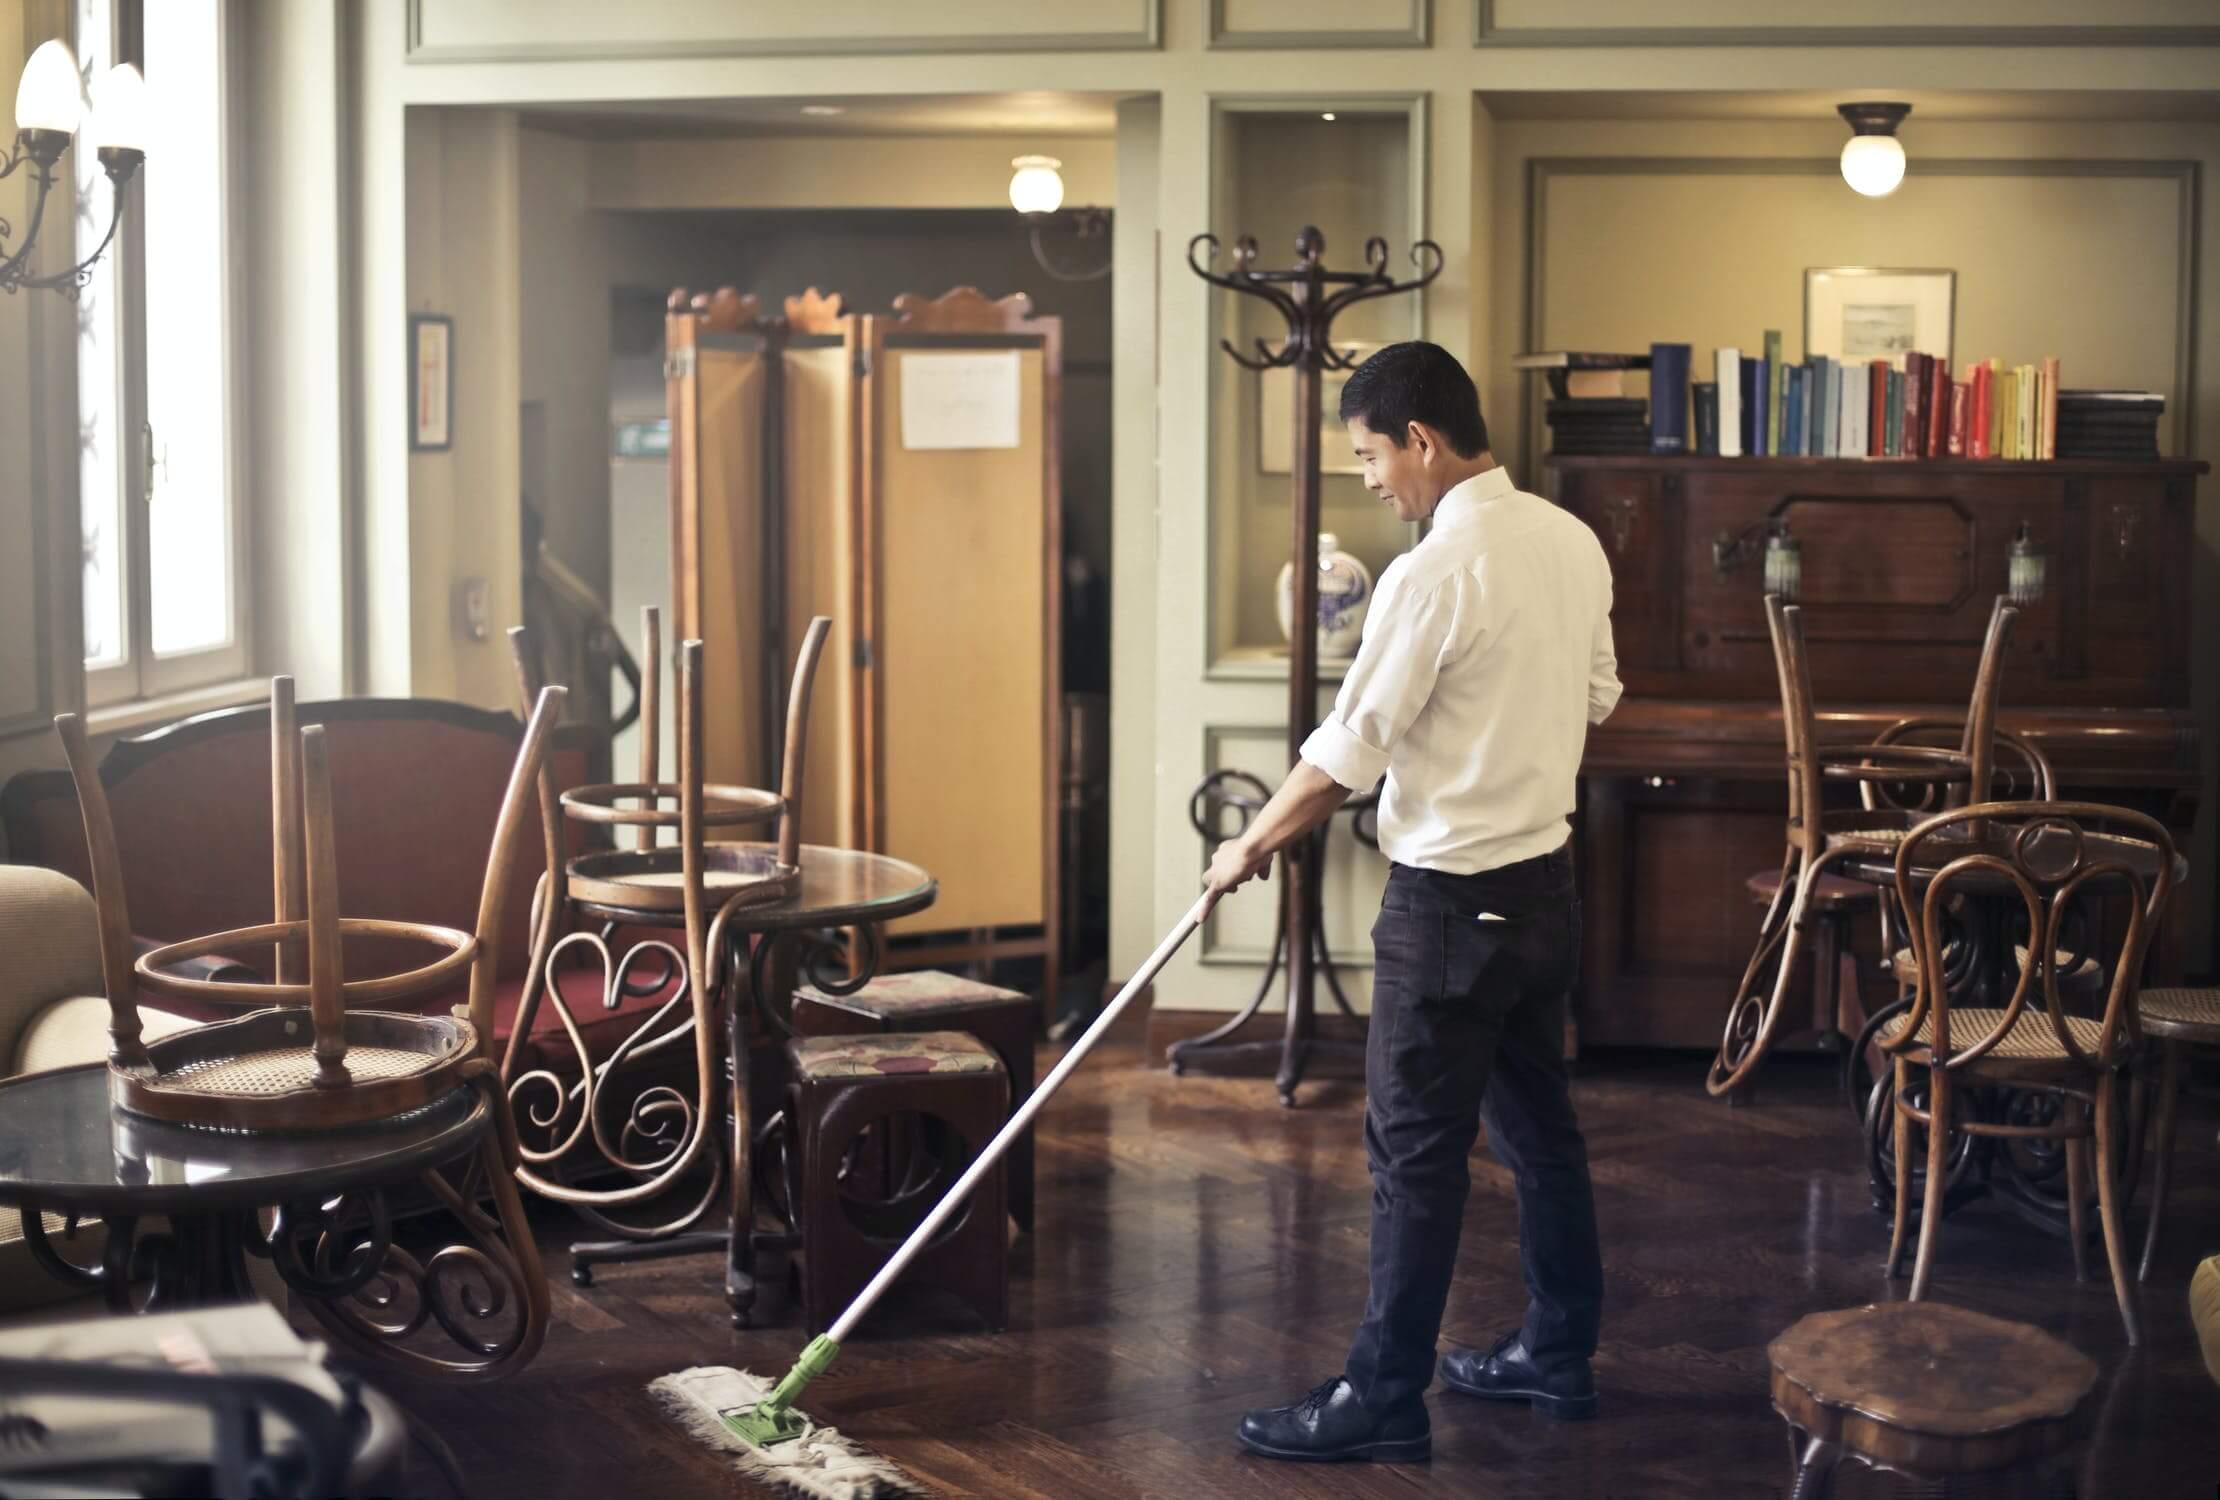 5 Best Rubbermaid Mops For All Floors